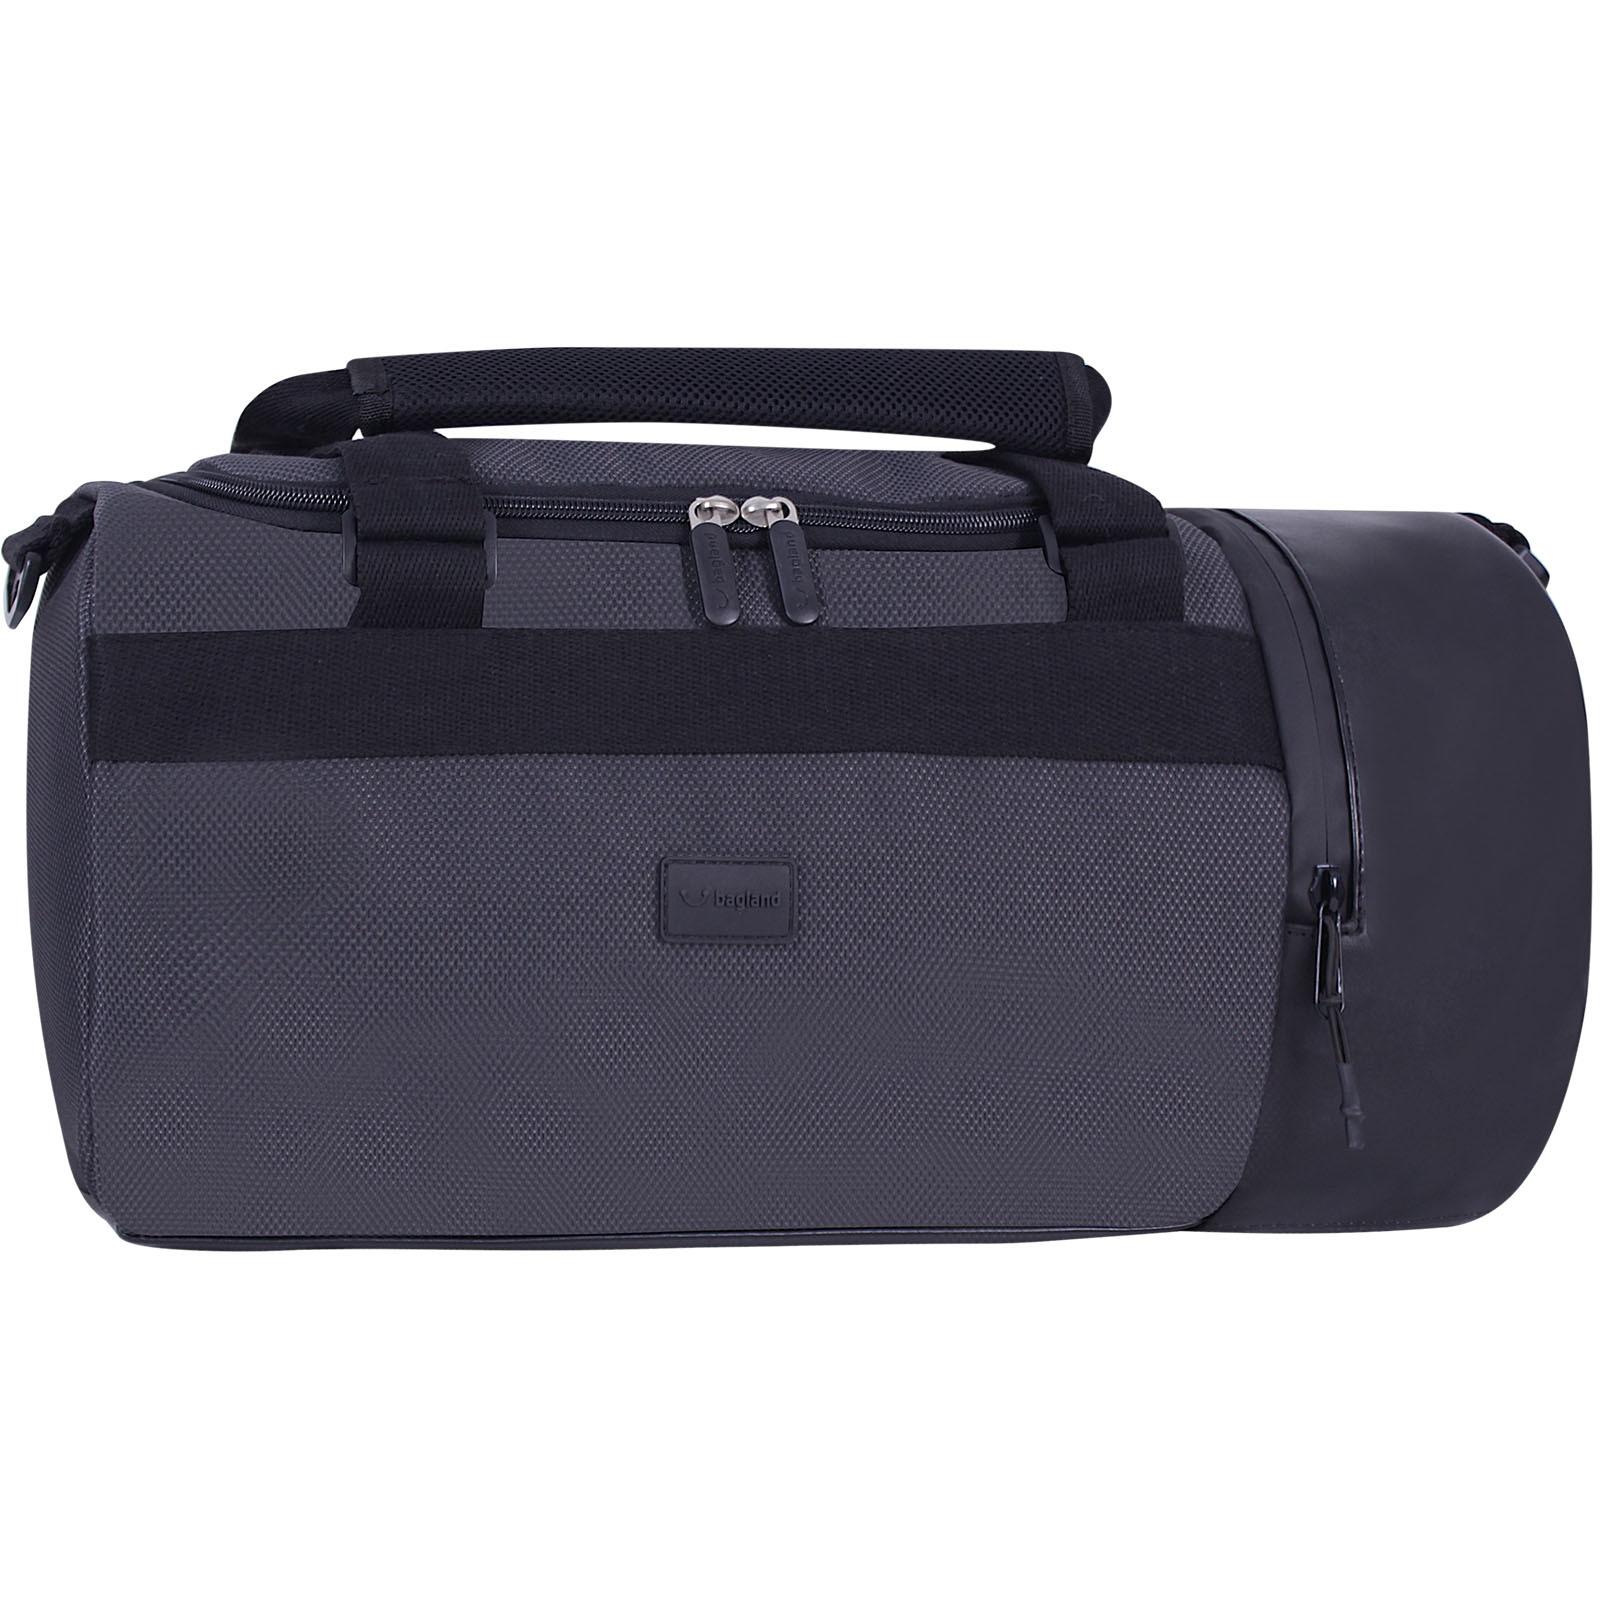 Спортивные сумки Сумка Bagland Klerk 22 л. Чёрный (00327169) IMG_5903-1600.jpg